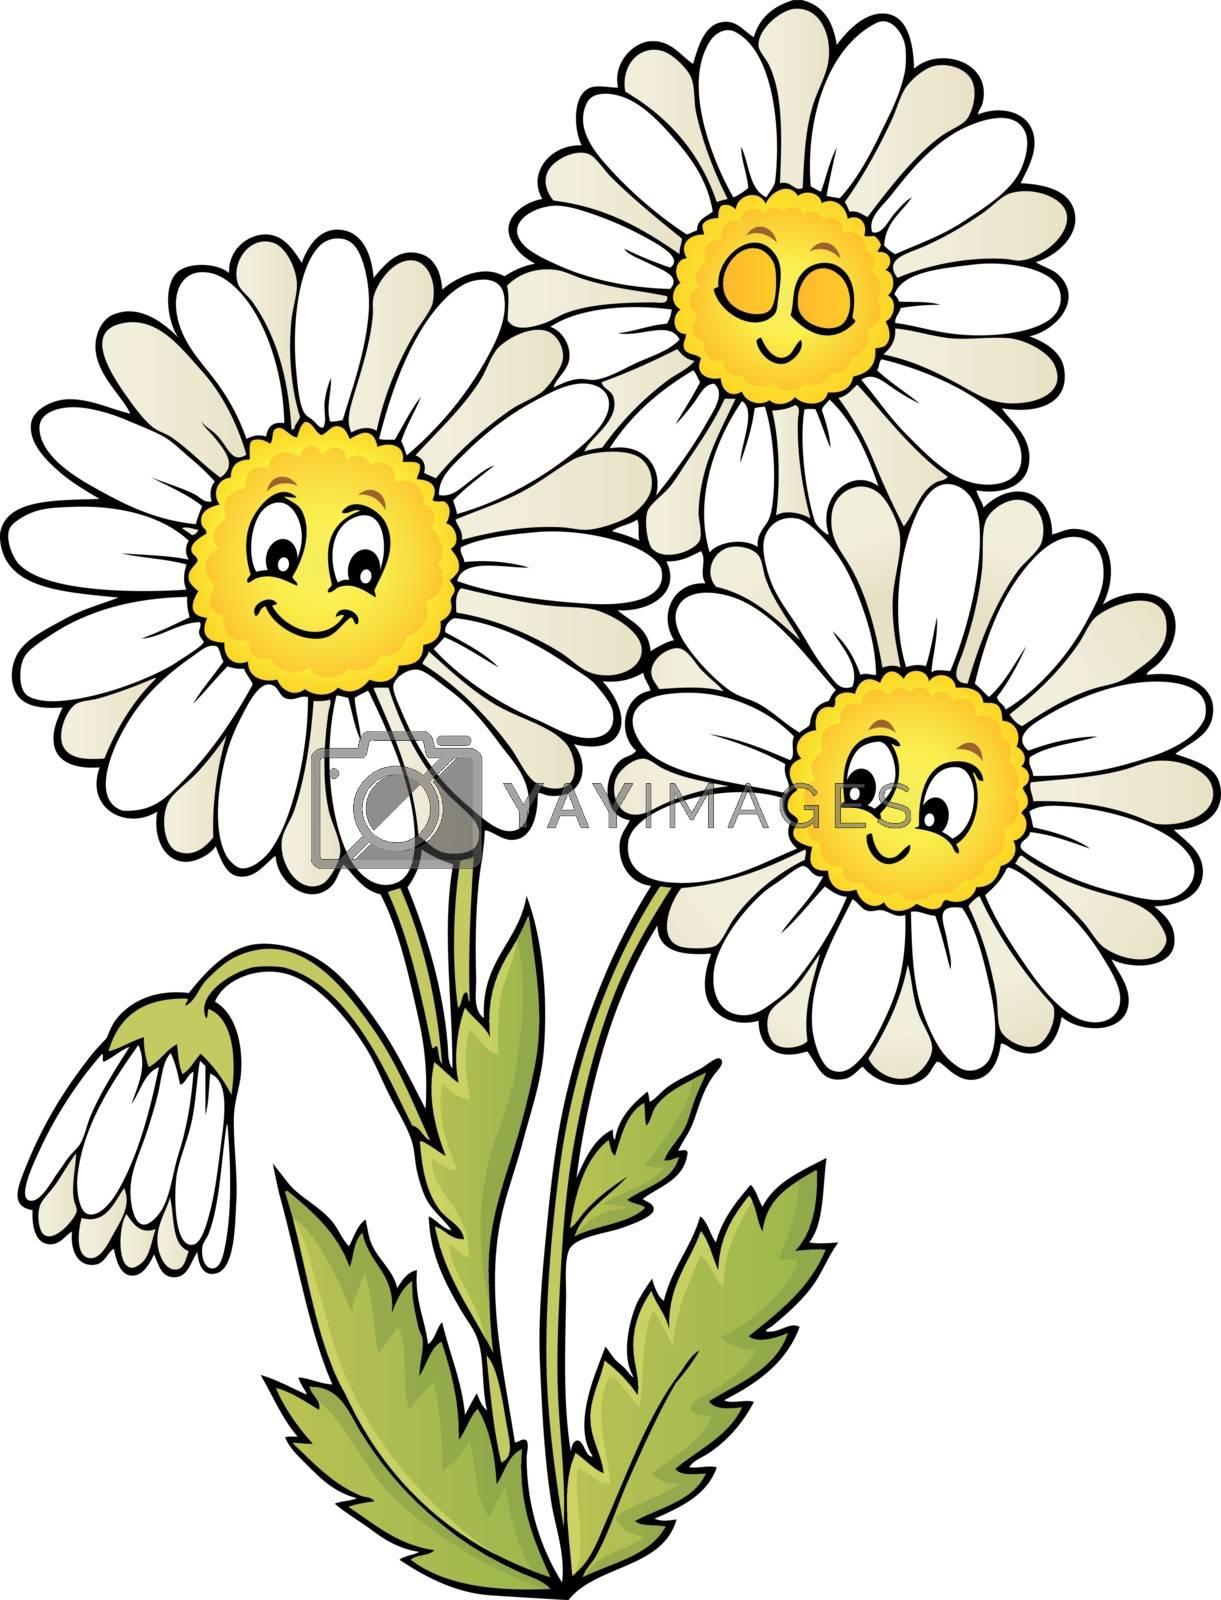 Daisy flower theme image 1 - eps10 vector illustration.